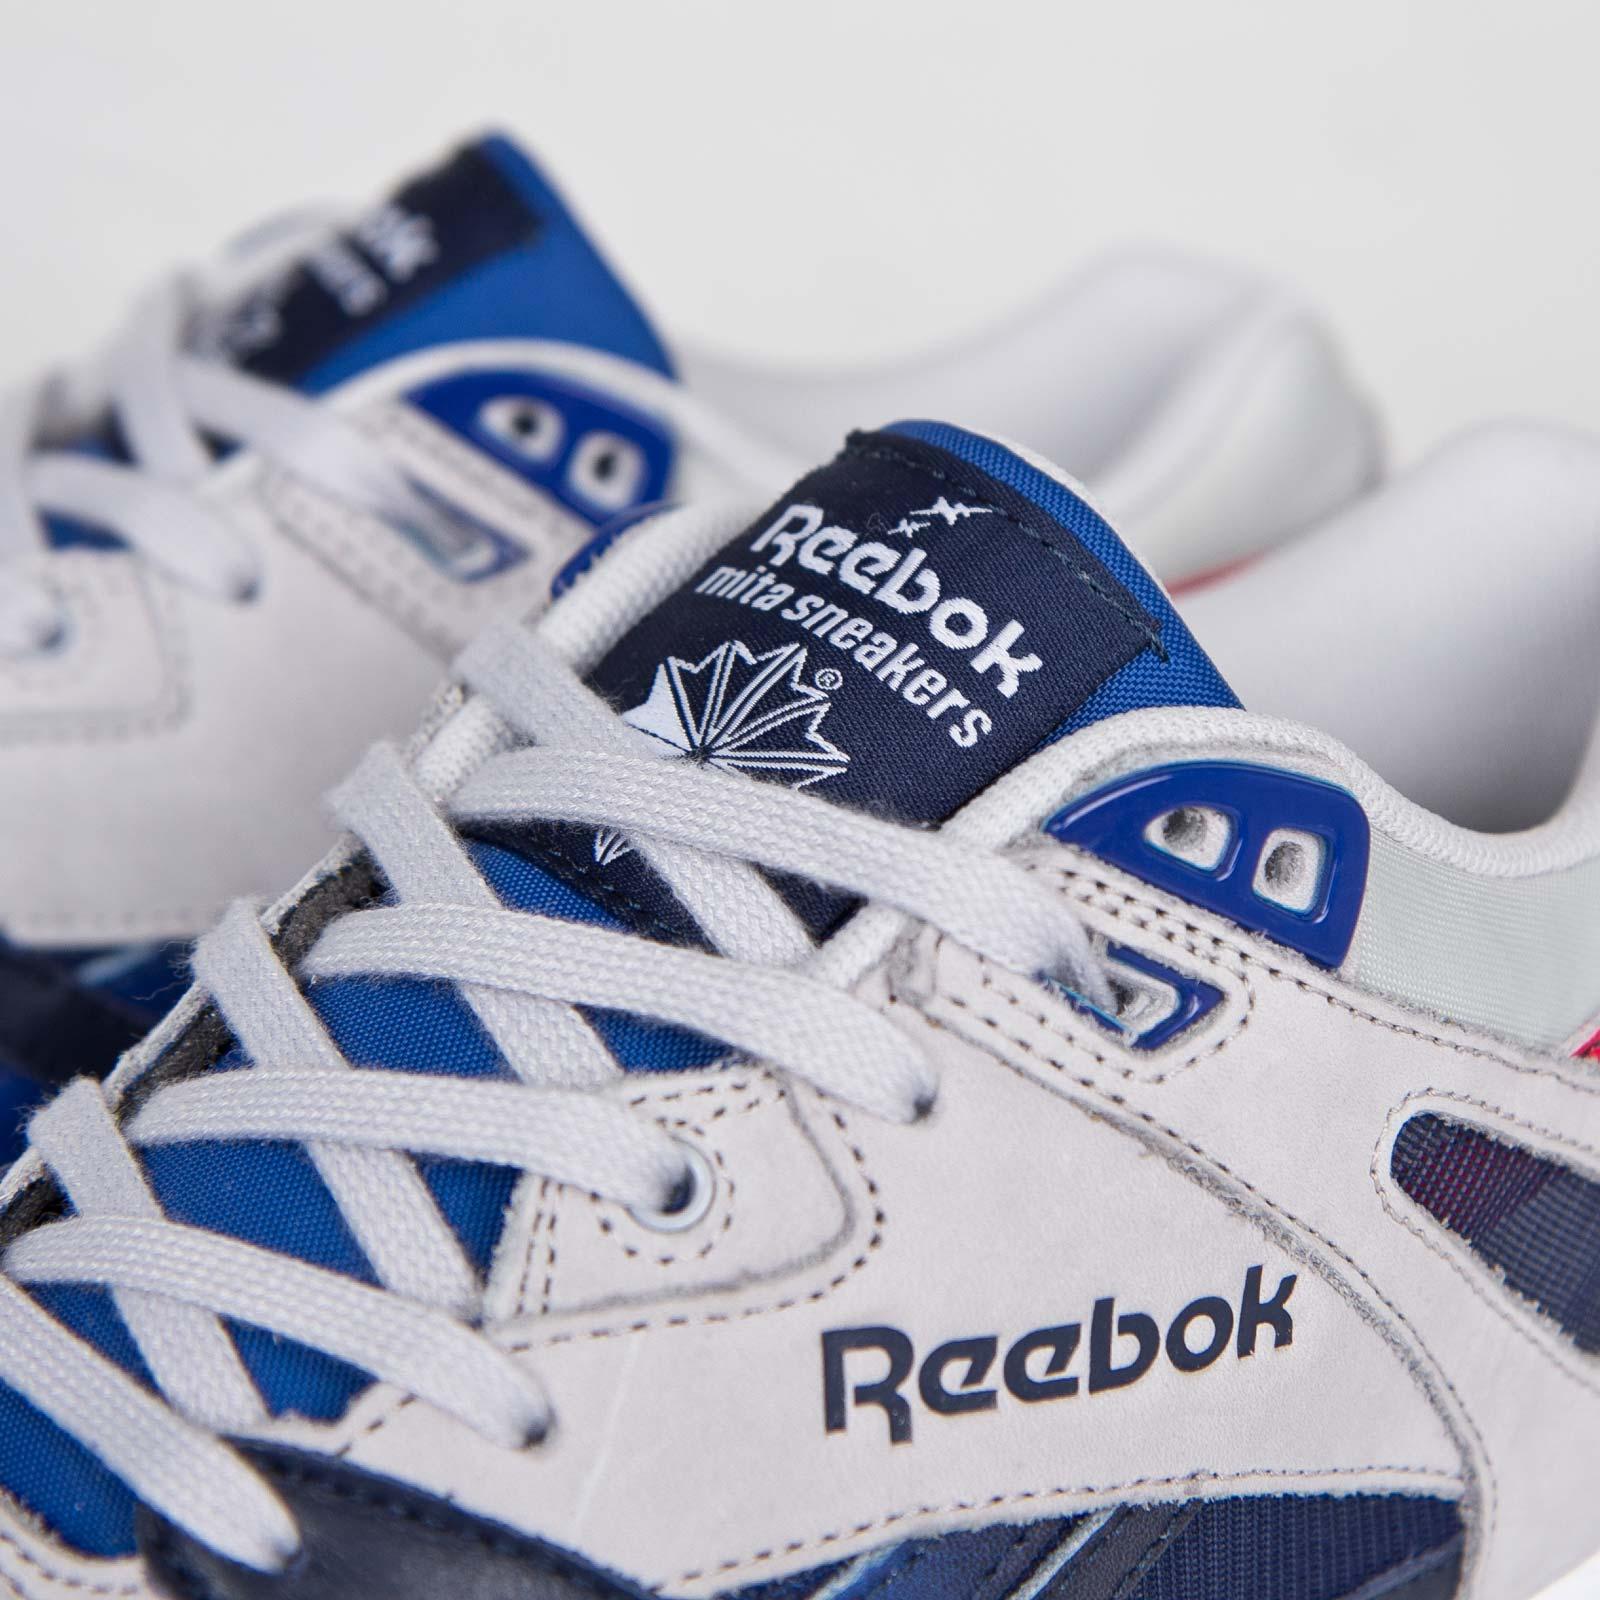 6357b3cde6a Reebok Ventilator Affiliates - V63495 - Sneakersnstuff